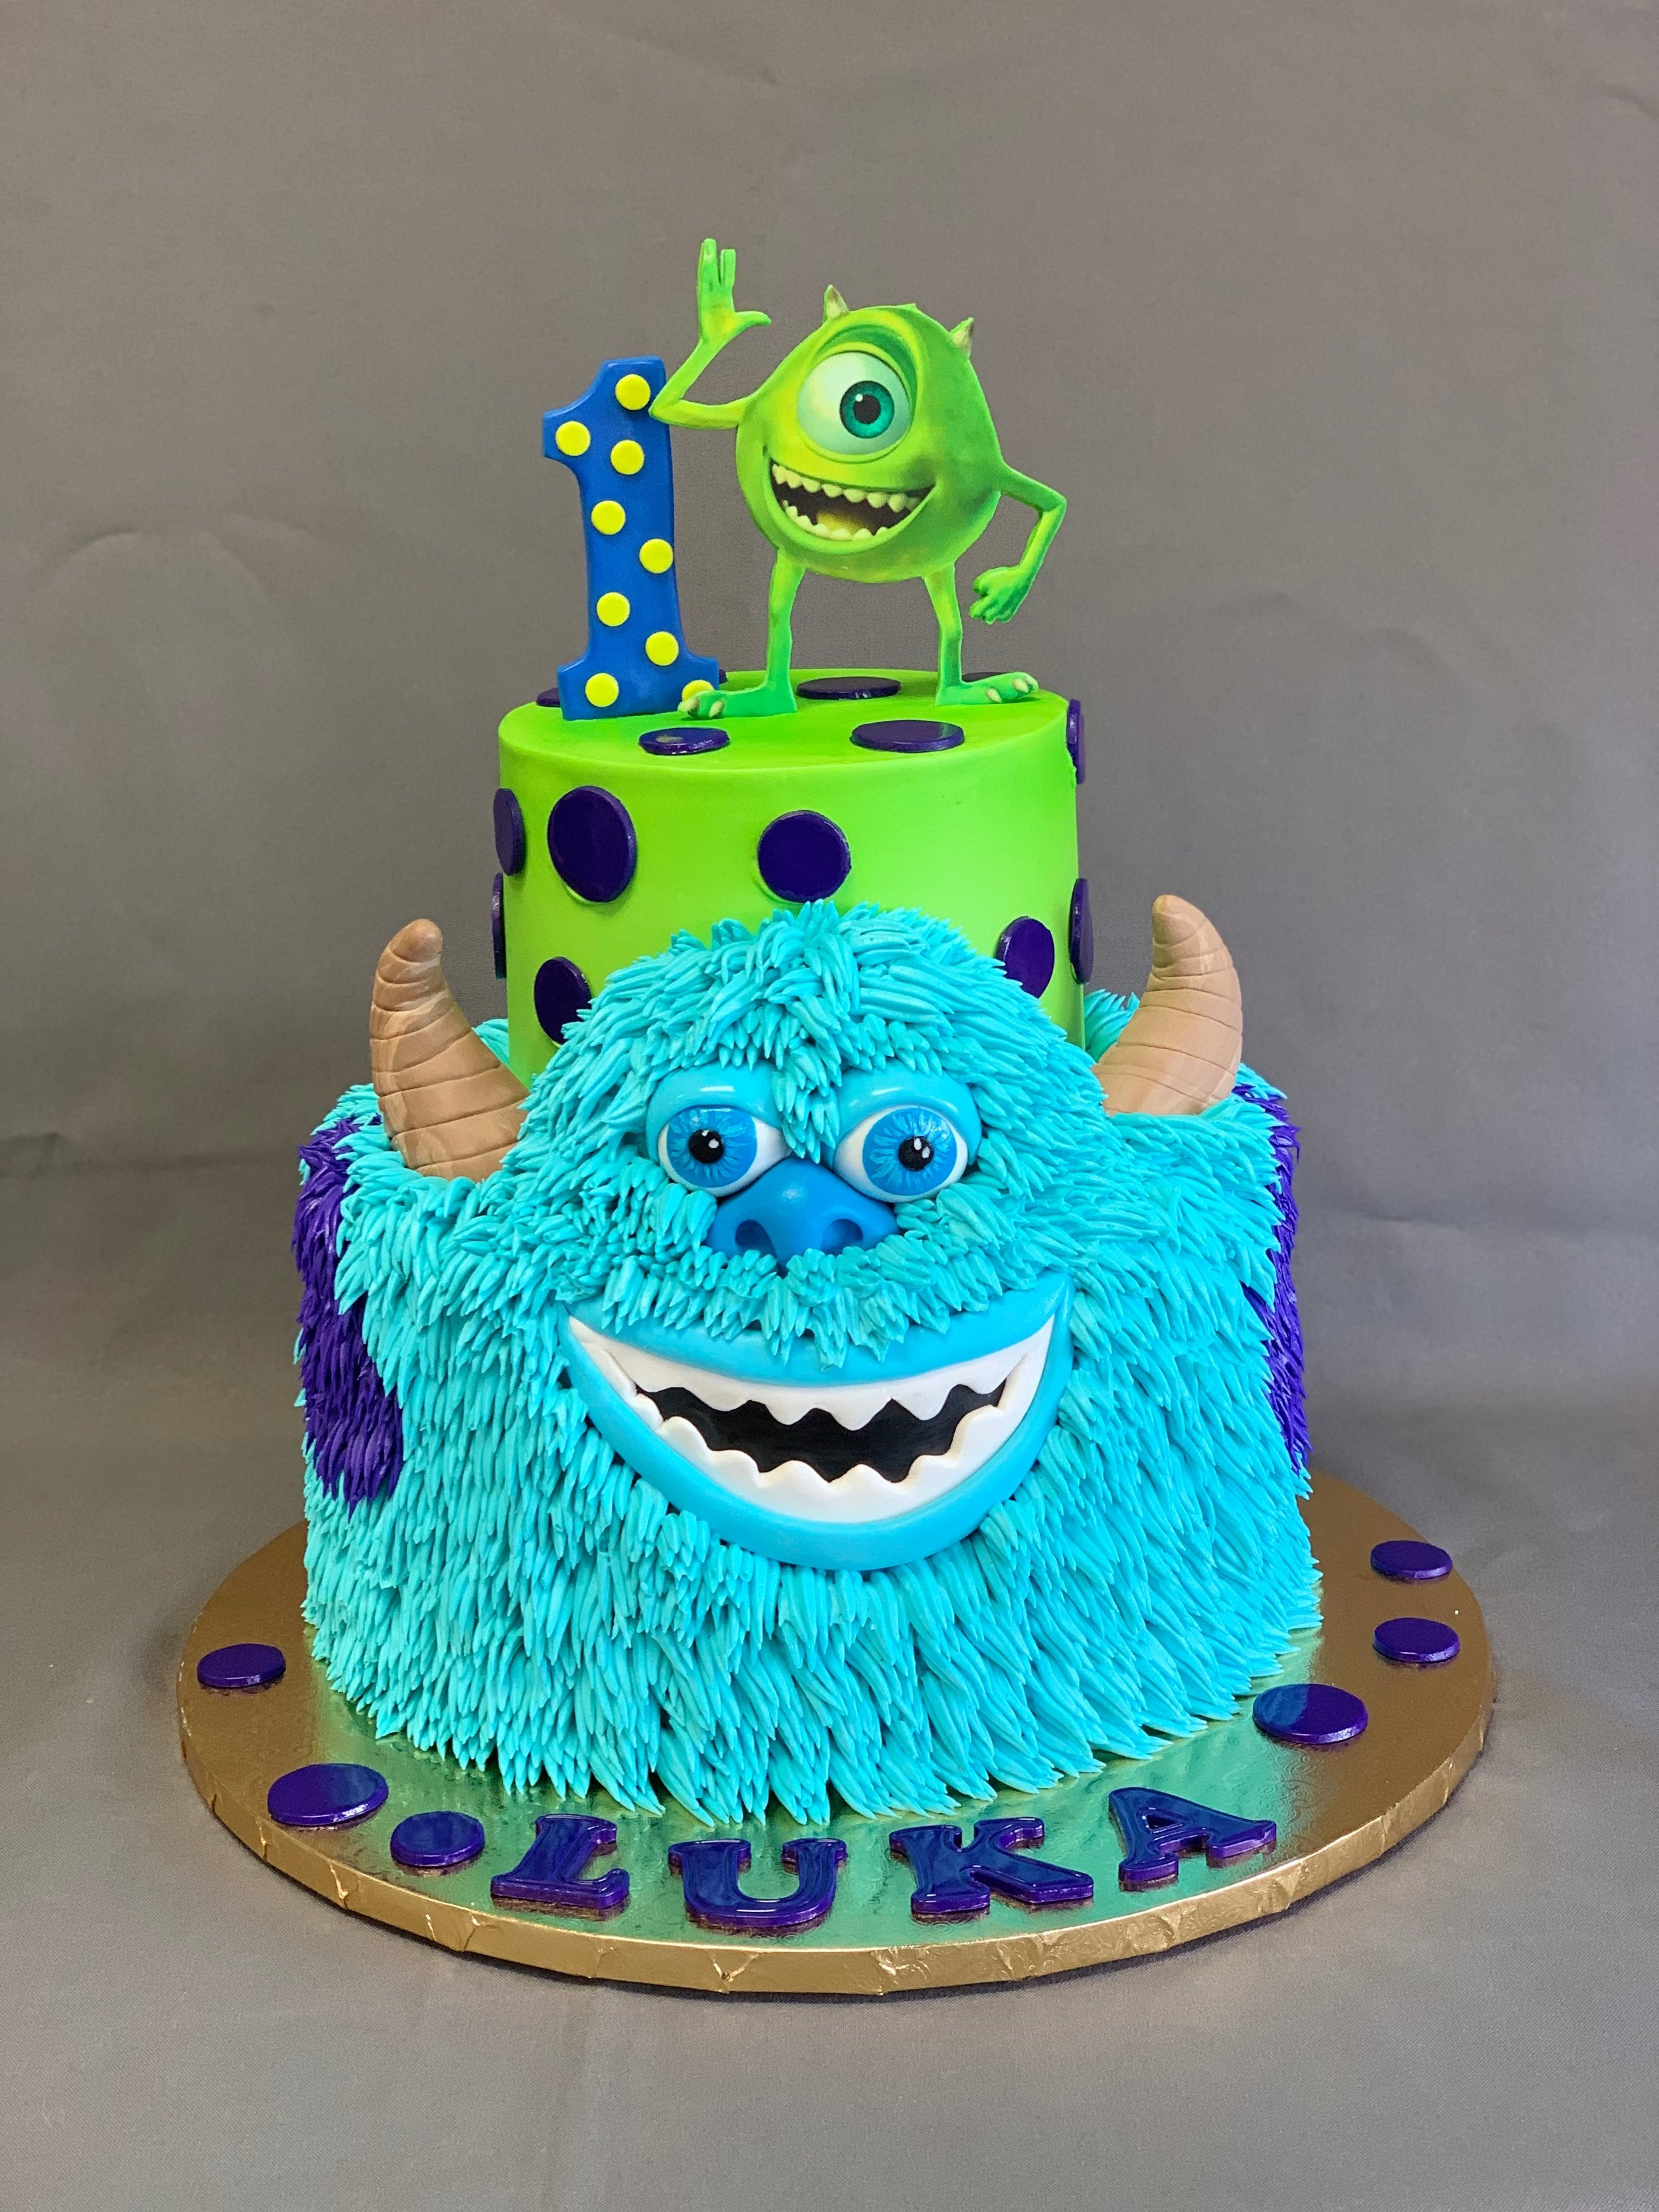 Monsters Inc 1st Birthday Cake Skazka Desserts Bakery Nj Custom Birthday Cakes Cupcakes Shop